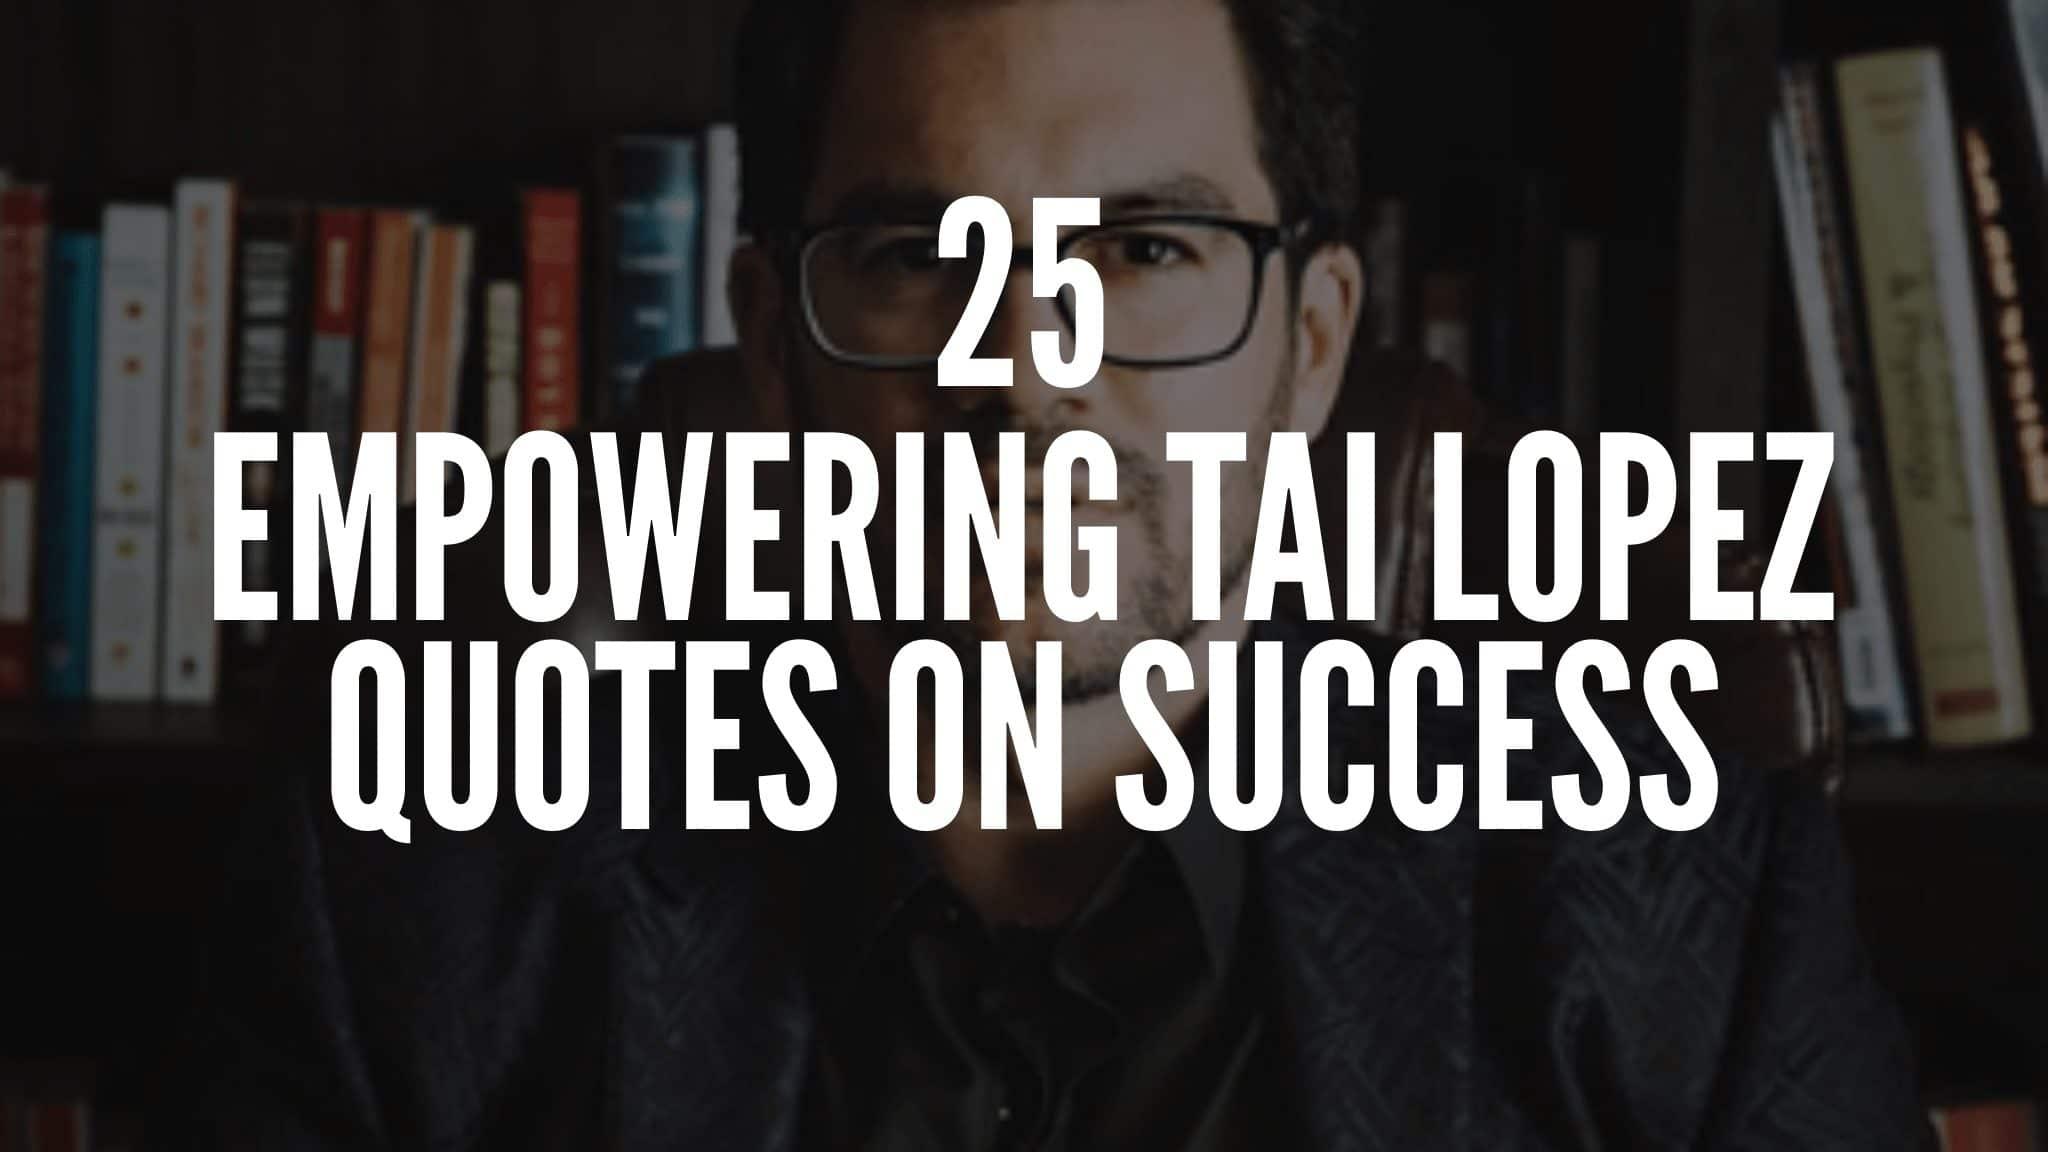 Tai Lopez Quotes On Success